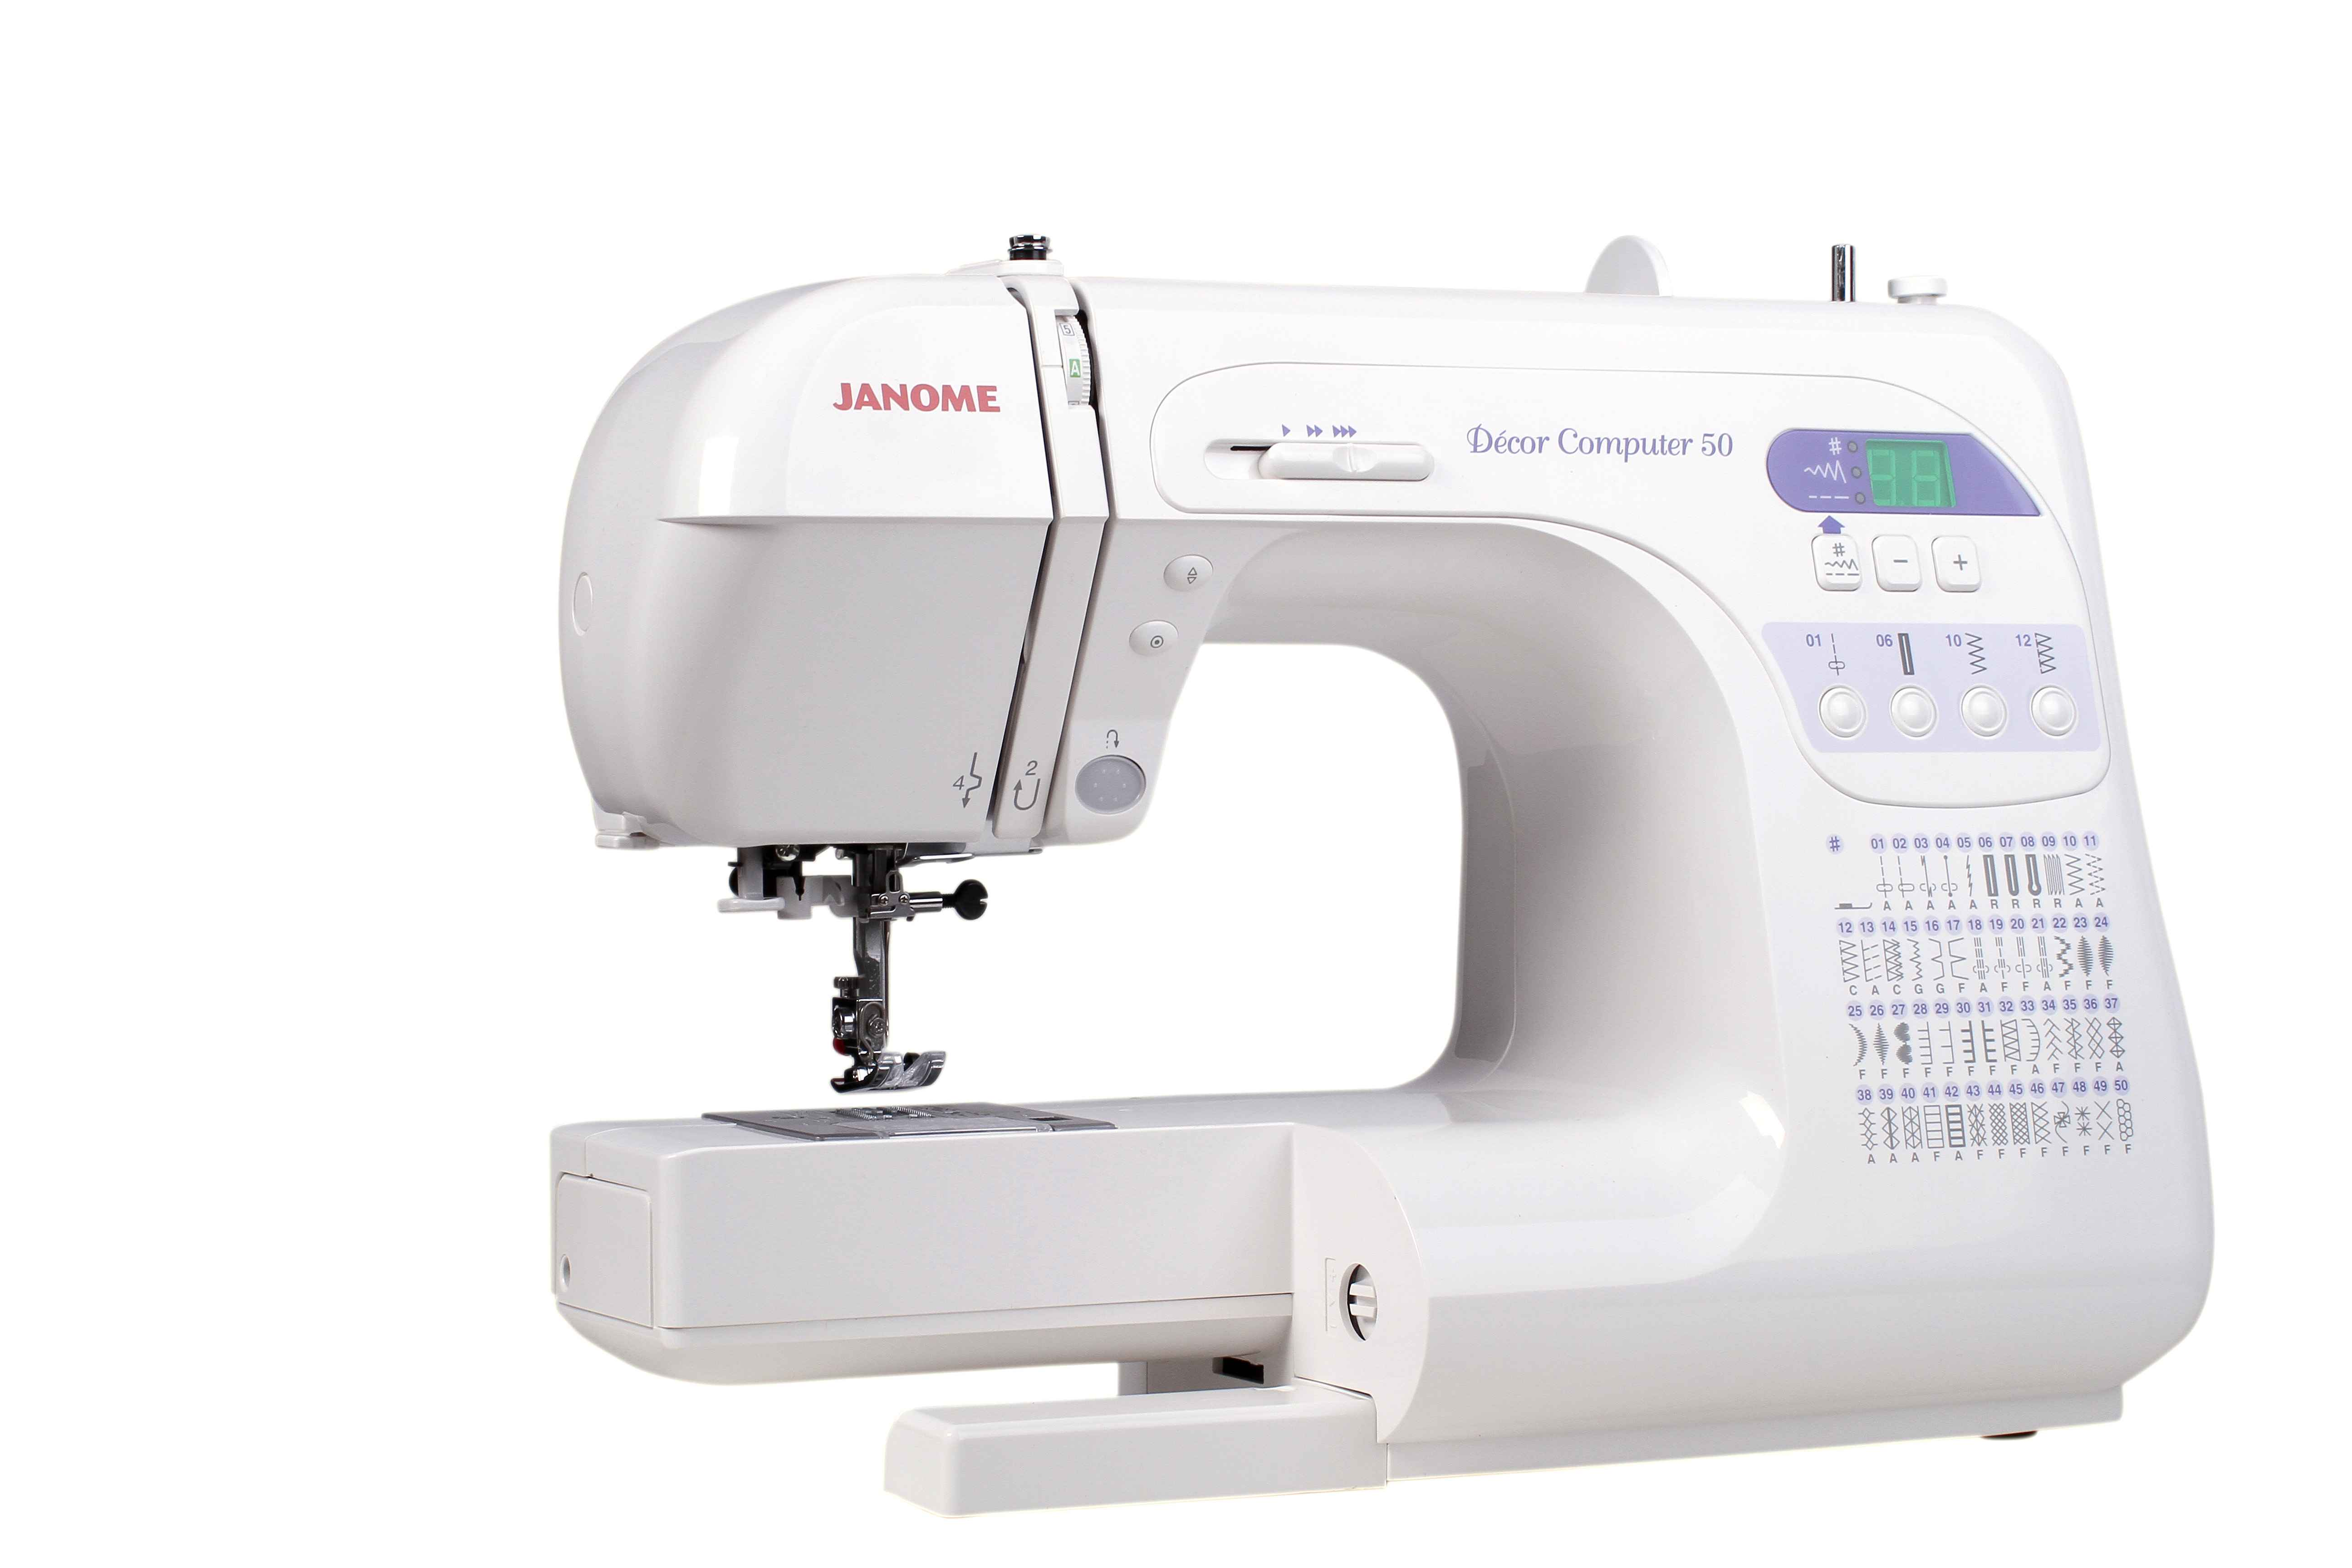 Швейная машина Janome DC 3050 / DC50 (жёсткий чехол) цена